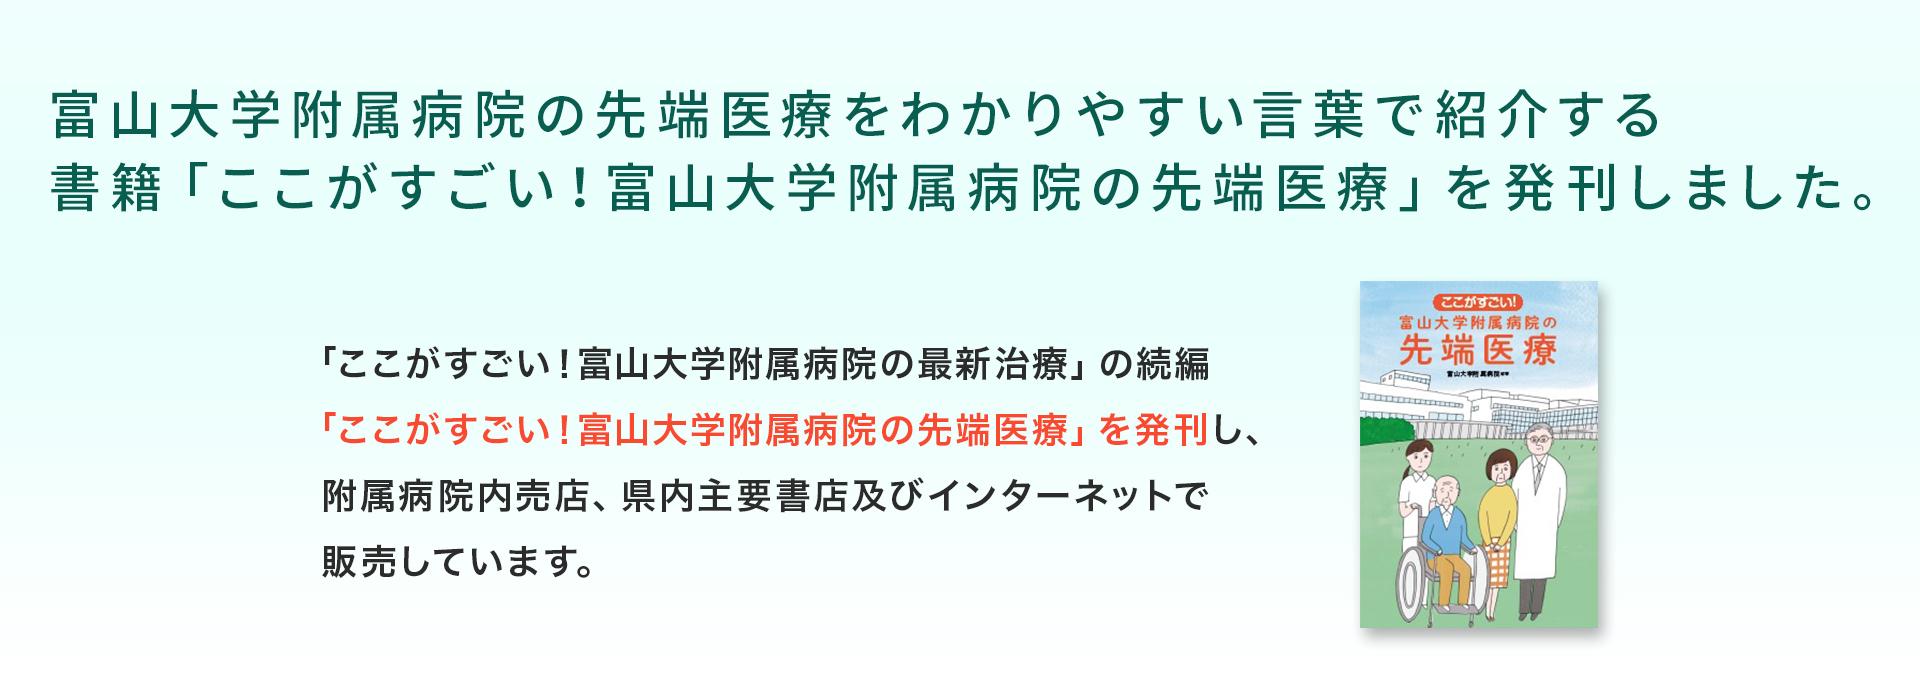 者 コロナ 名前 富山 県 感染